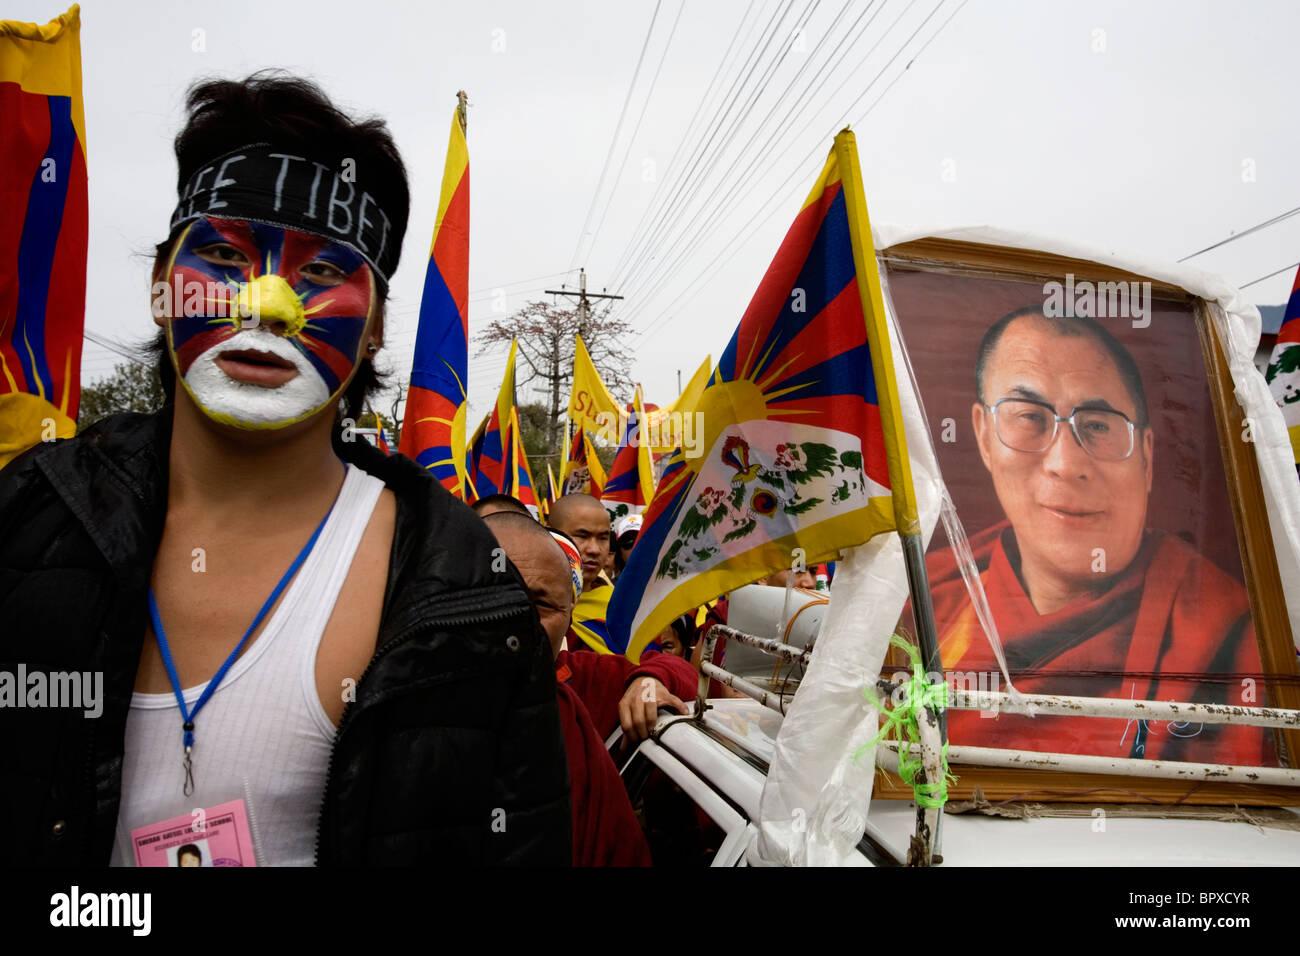 Demo for the 51th anniversary of Tibetan uprising, Dharamsala, Himachal Pradesh, India. - Stock Image